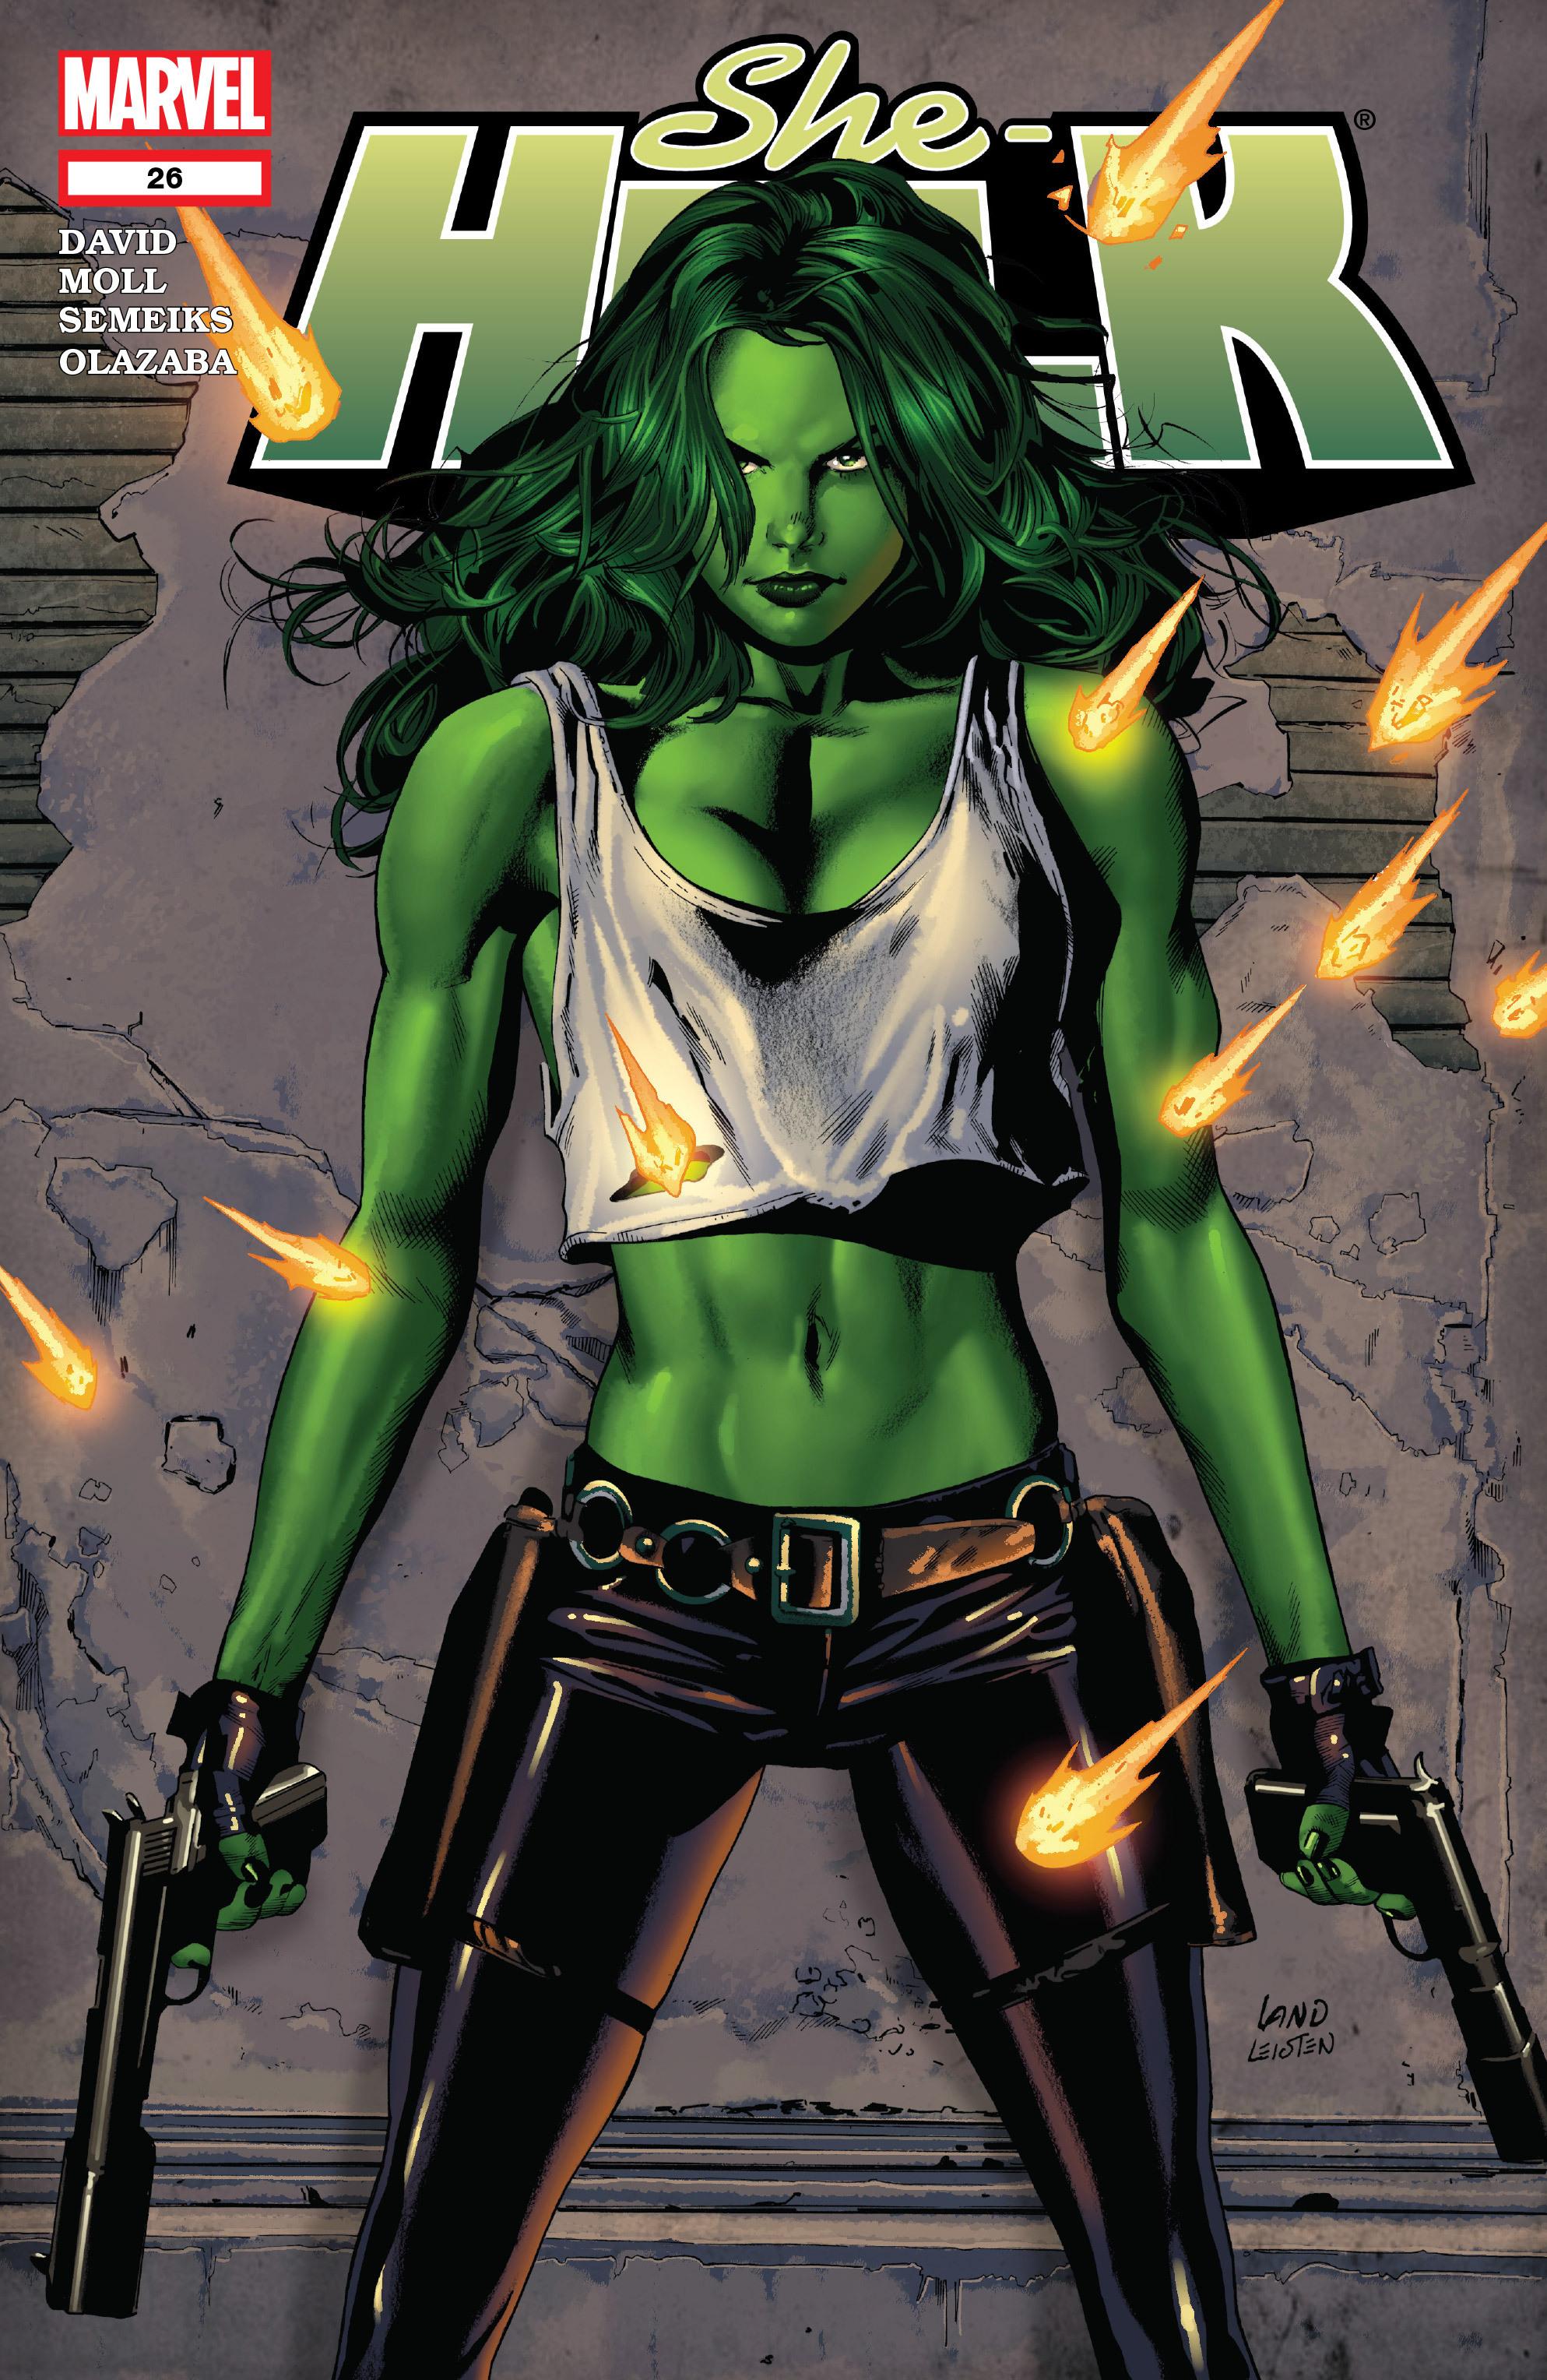 Read online She-Hulk (2005) comic -  Issue #26 - 1